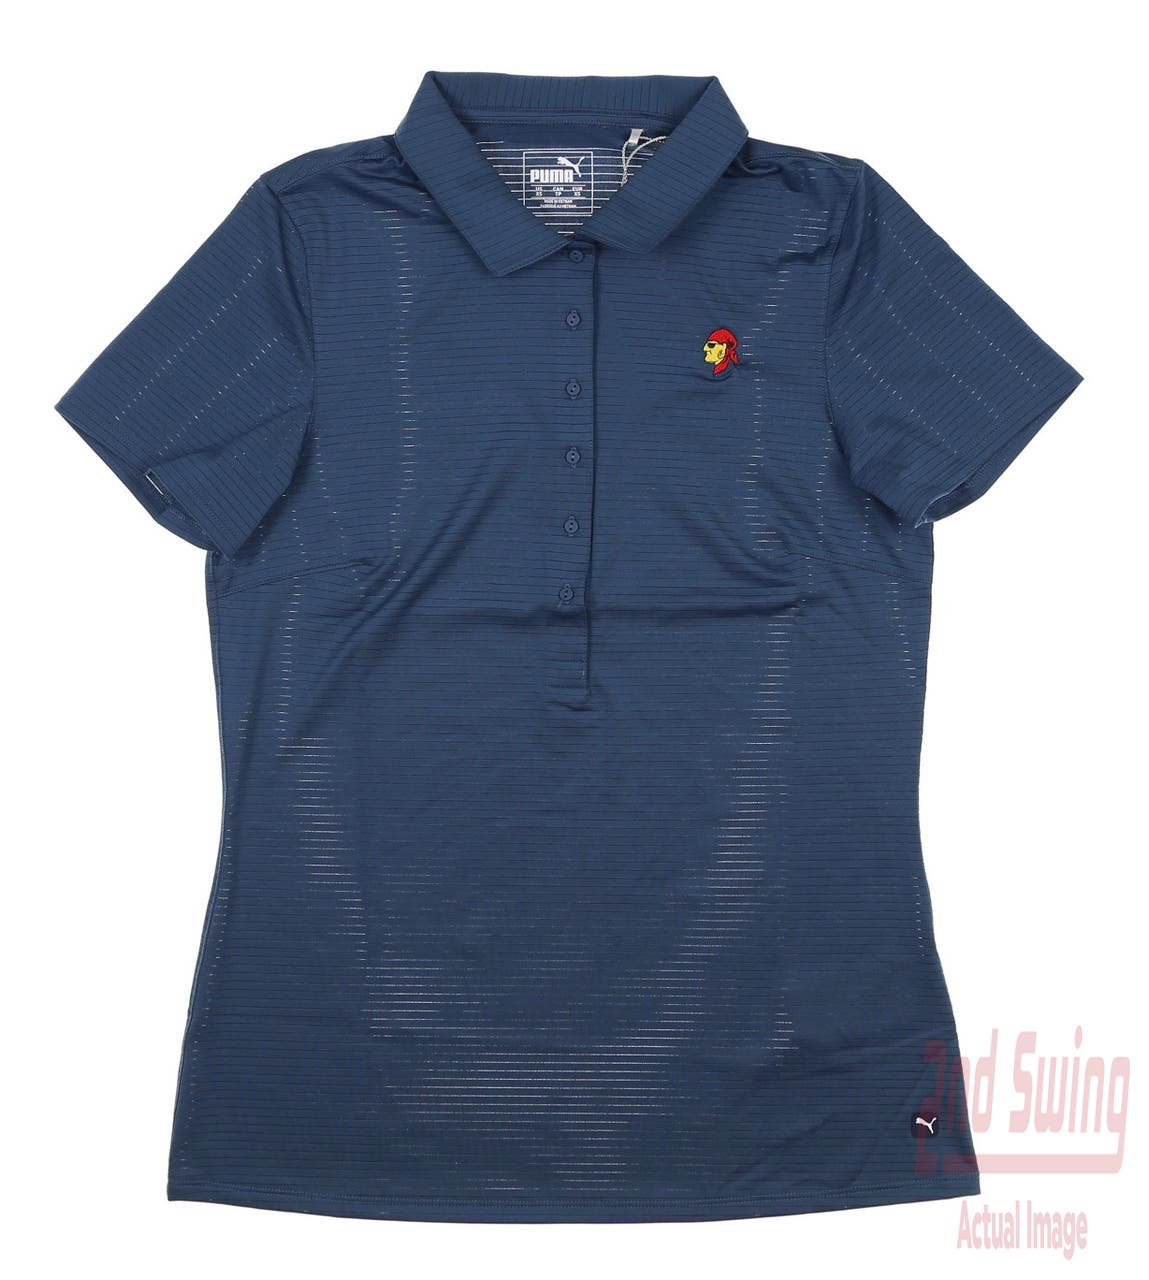 New W/ Logo Womens Puma Daily Golf Polo Small S Dark Denim MSRP $60 595826 04